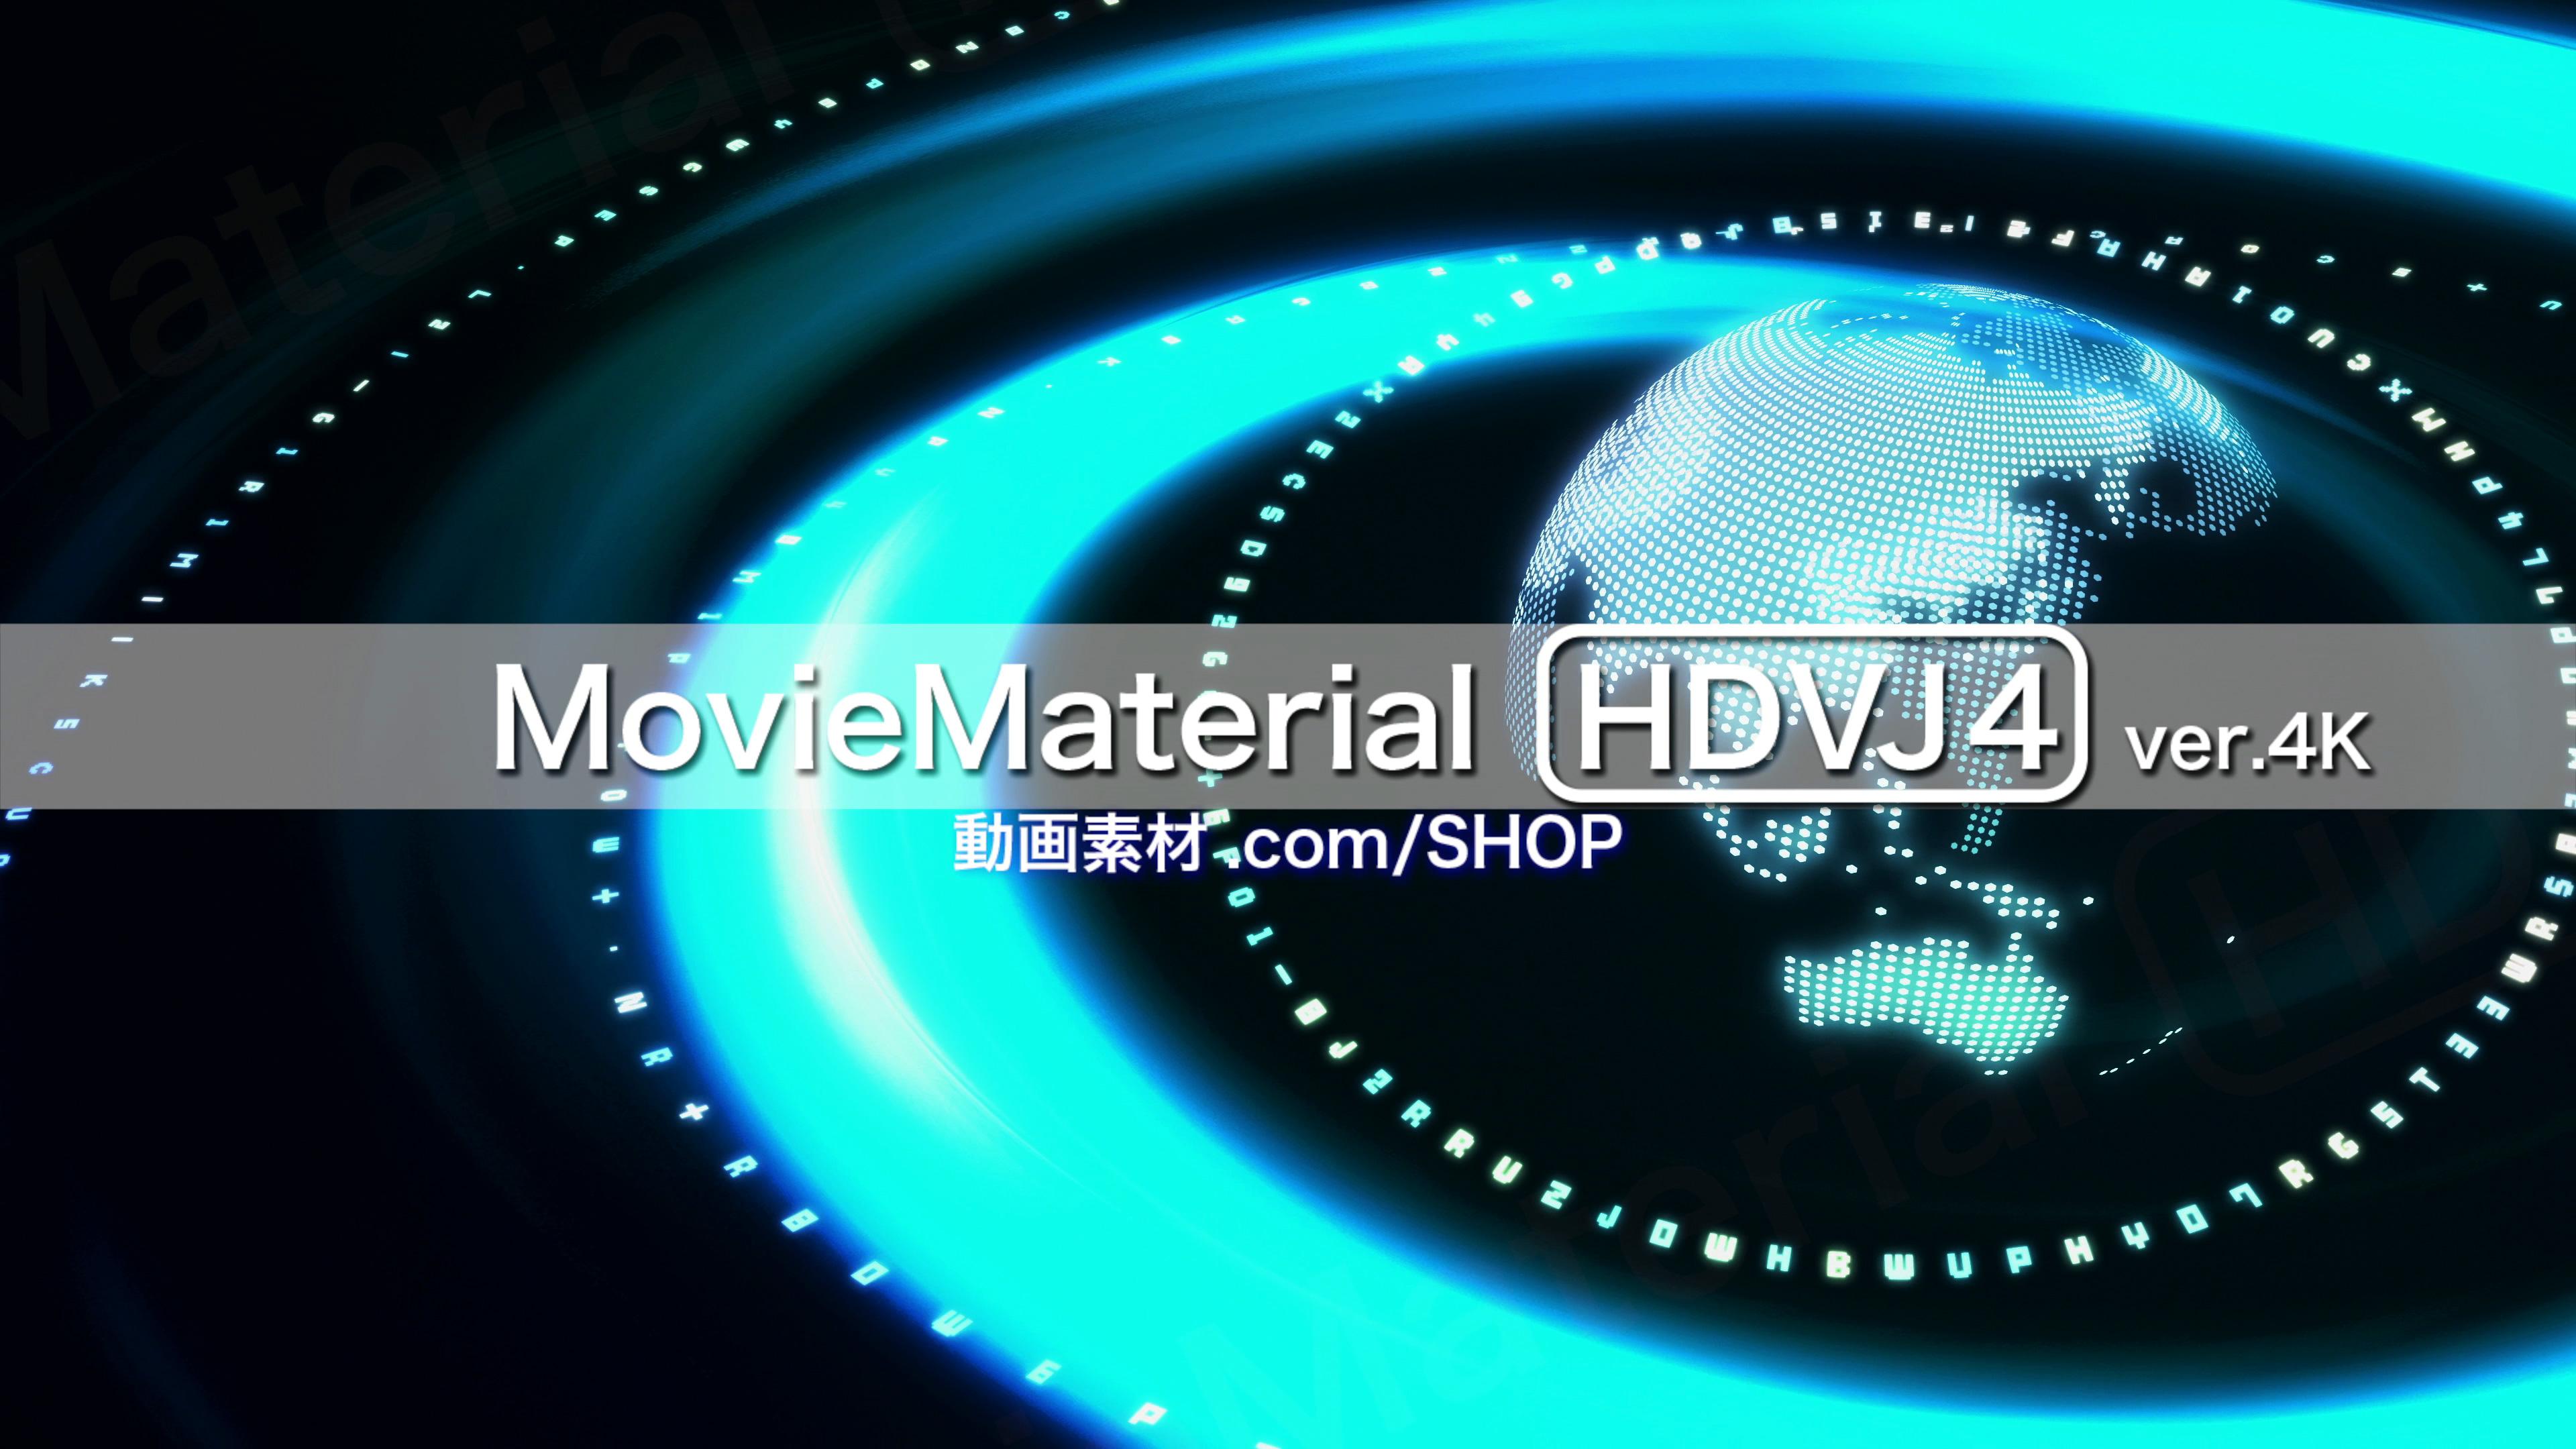 4K2Kループ動画素材集第4段【MovieMaterial HDVJ4 ver.4K】ロイヤリティフリー(著作権使用料無料)7